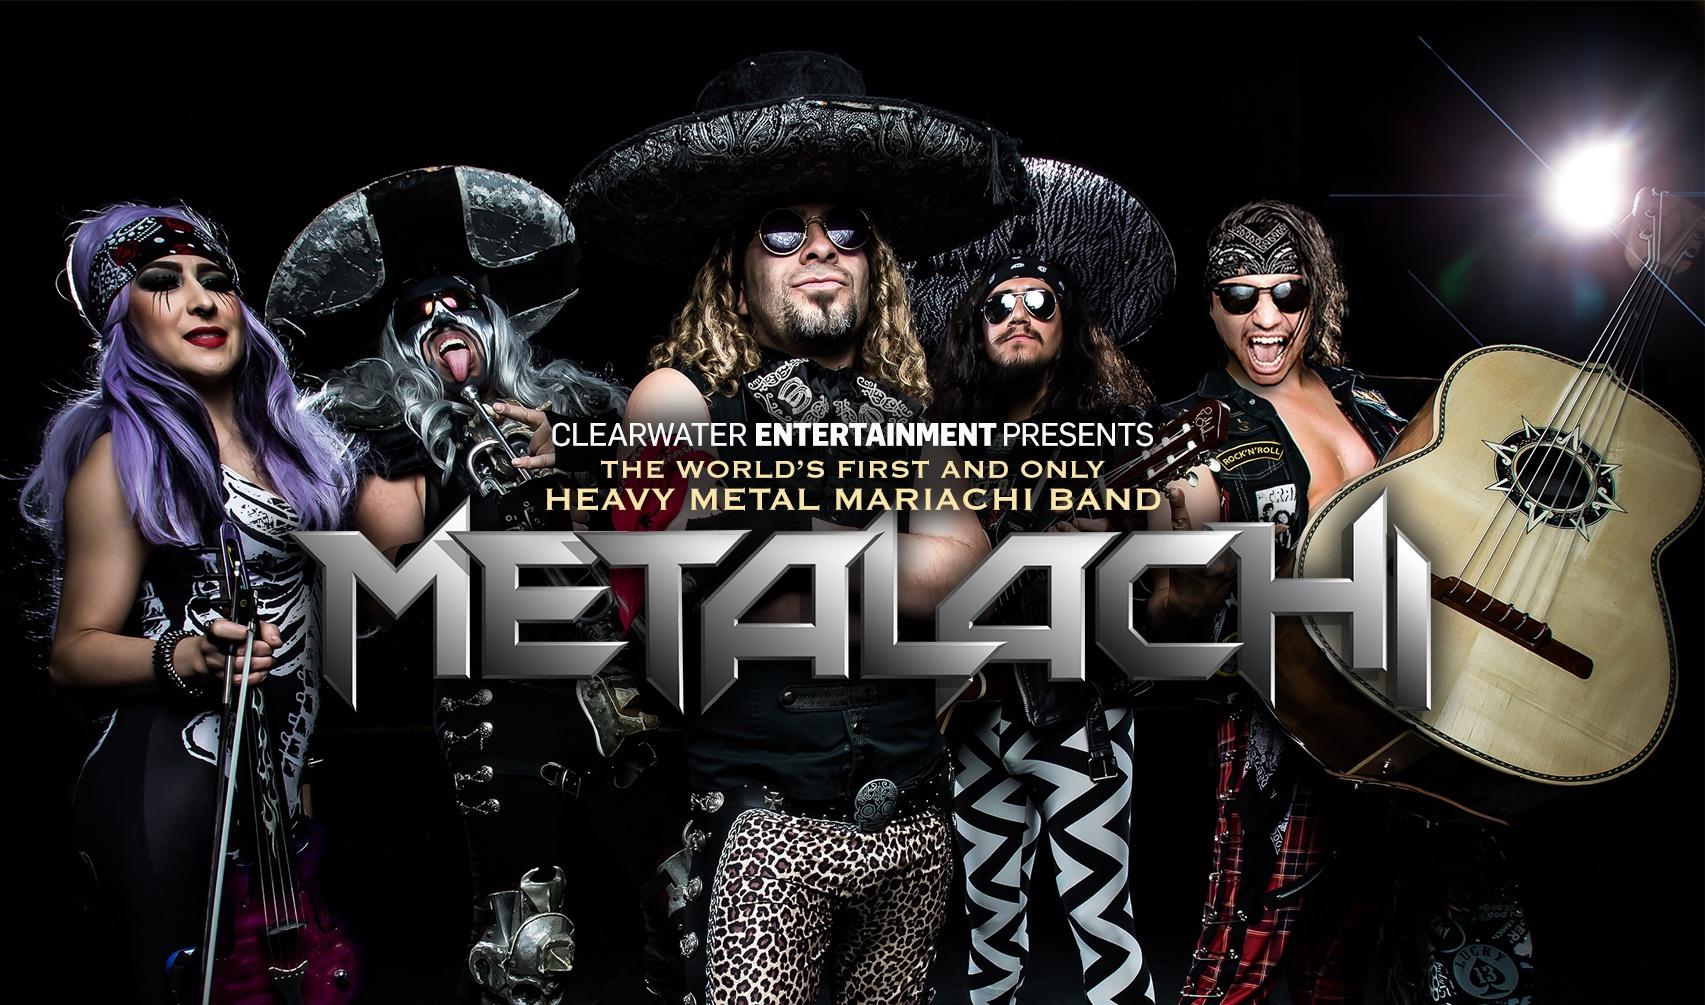 Metalachi Beach Rock Music & Sports